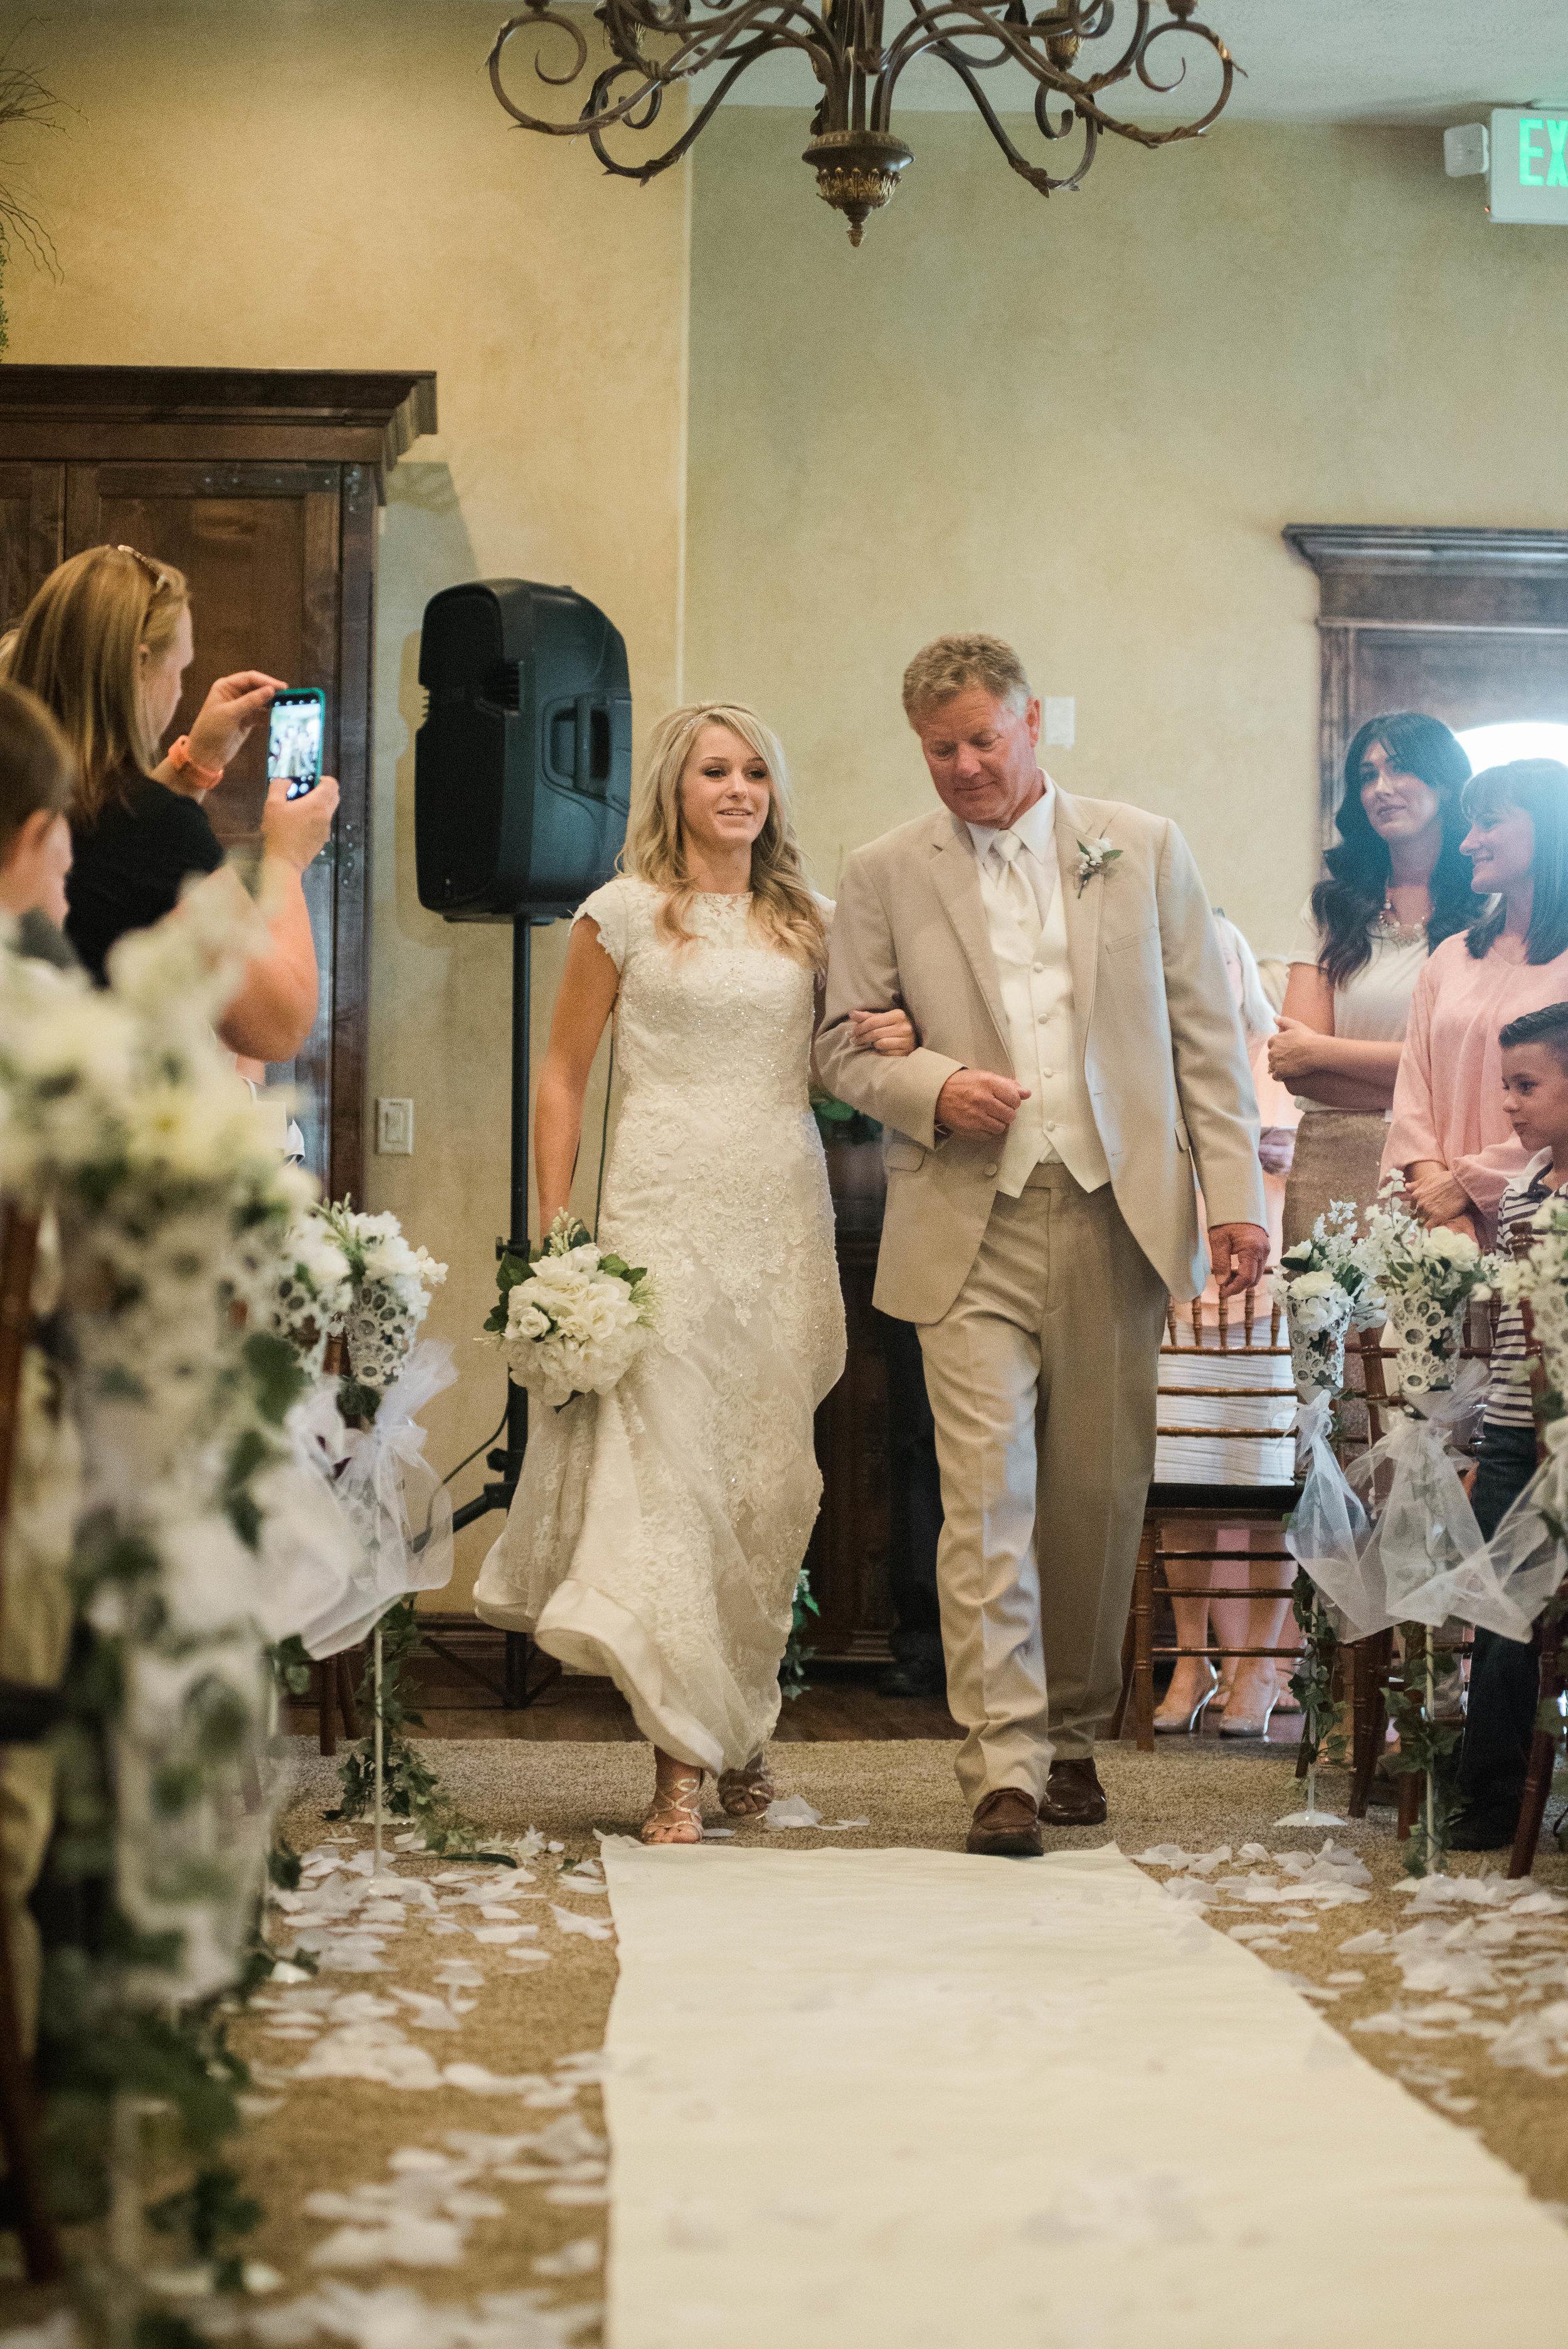 DANIEL+LACI-WEDDING-Sadie_Banks_Photography-150.jpg